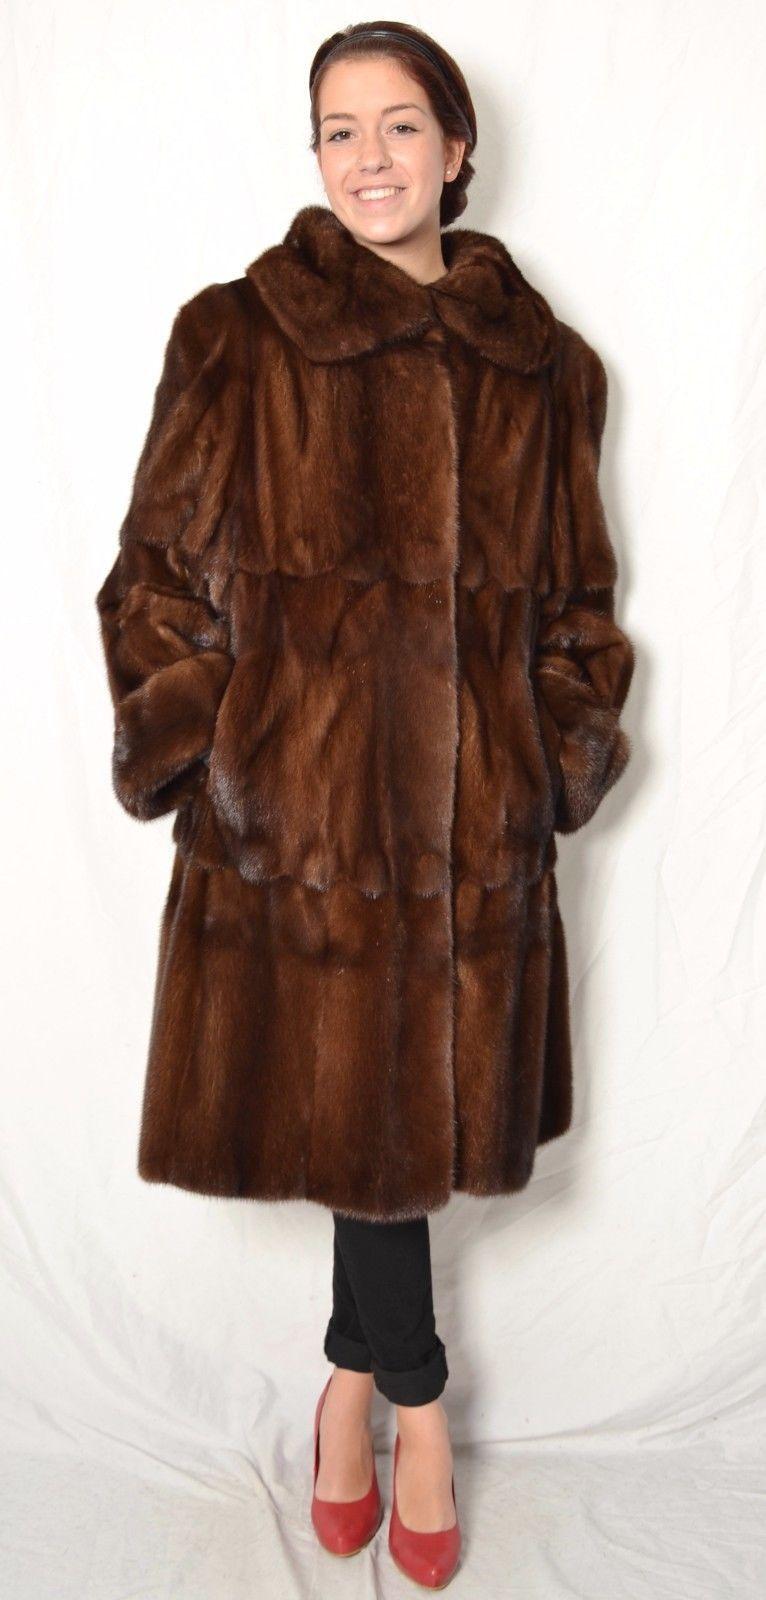 US39 soft Mink Fur Coat Jacket Swinger skin on Skin PELLICCIA VISONE ca. XL | eBay